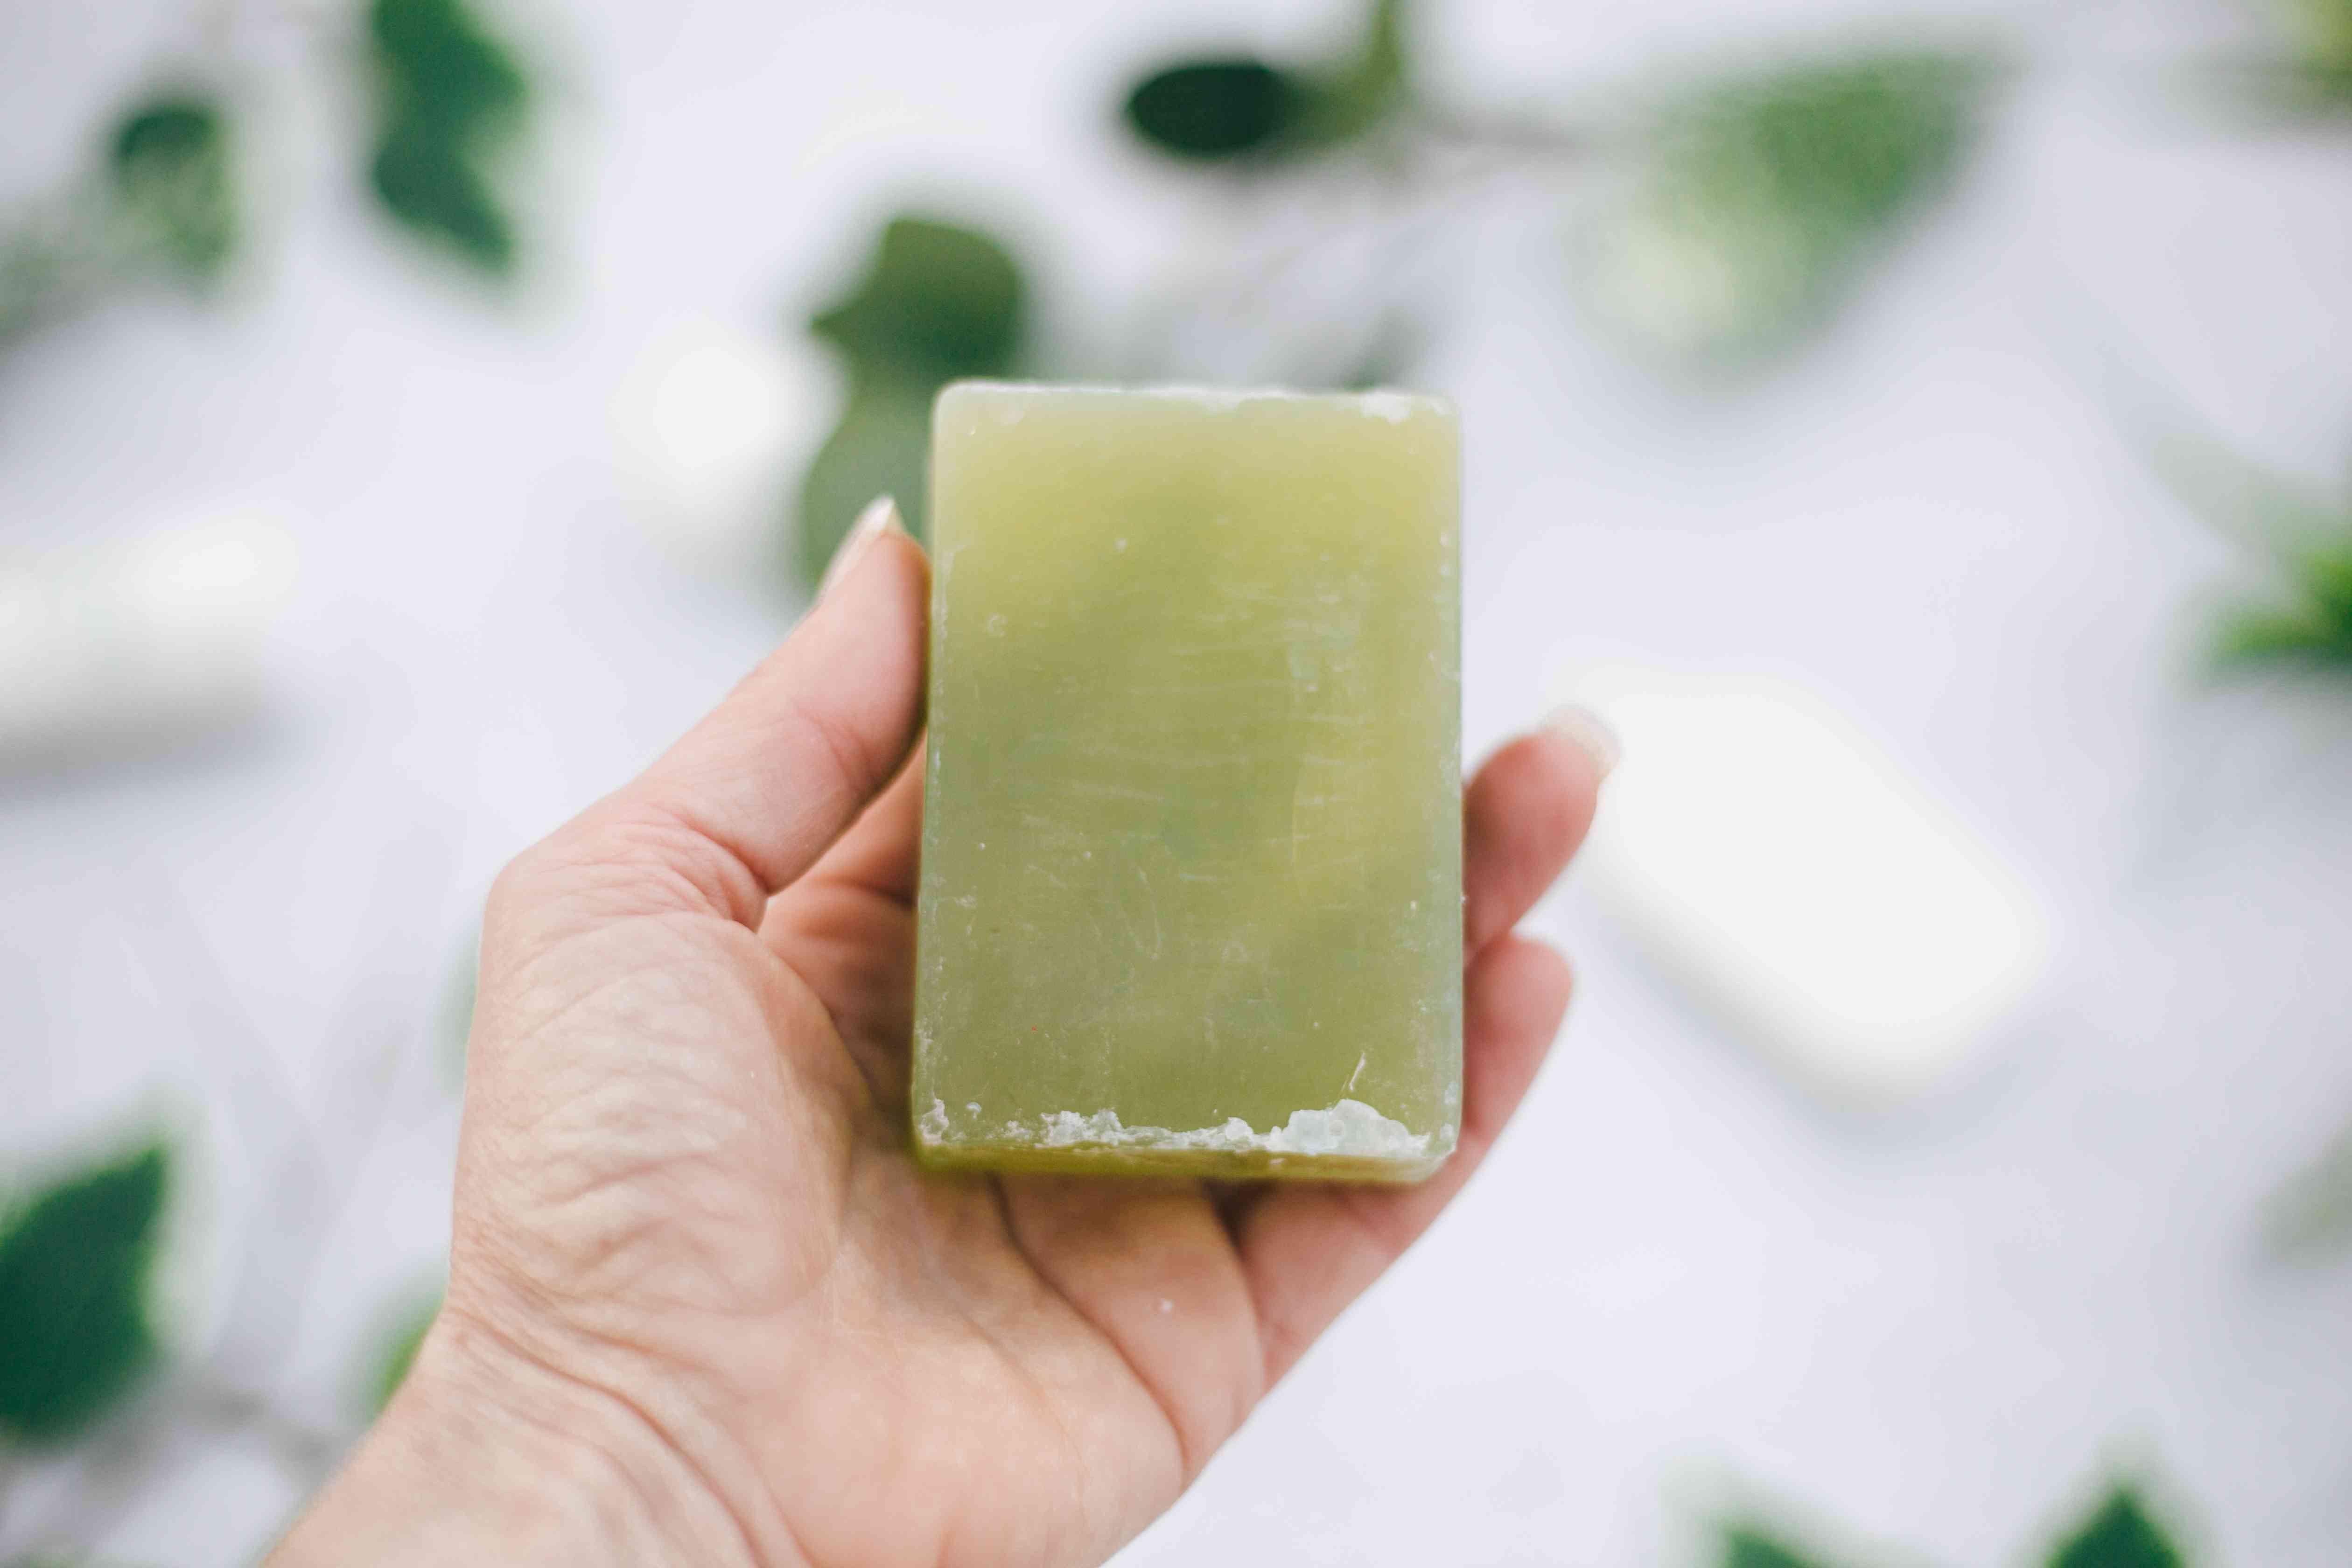 woman hand holding handmade green soap